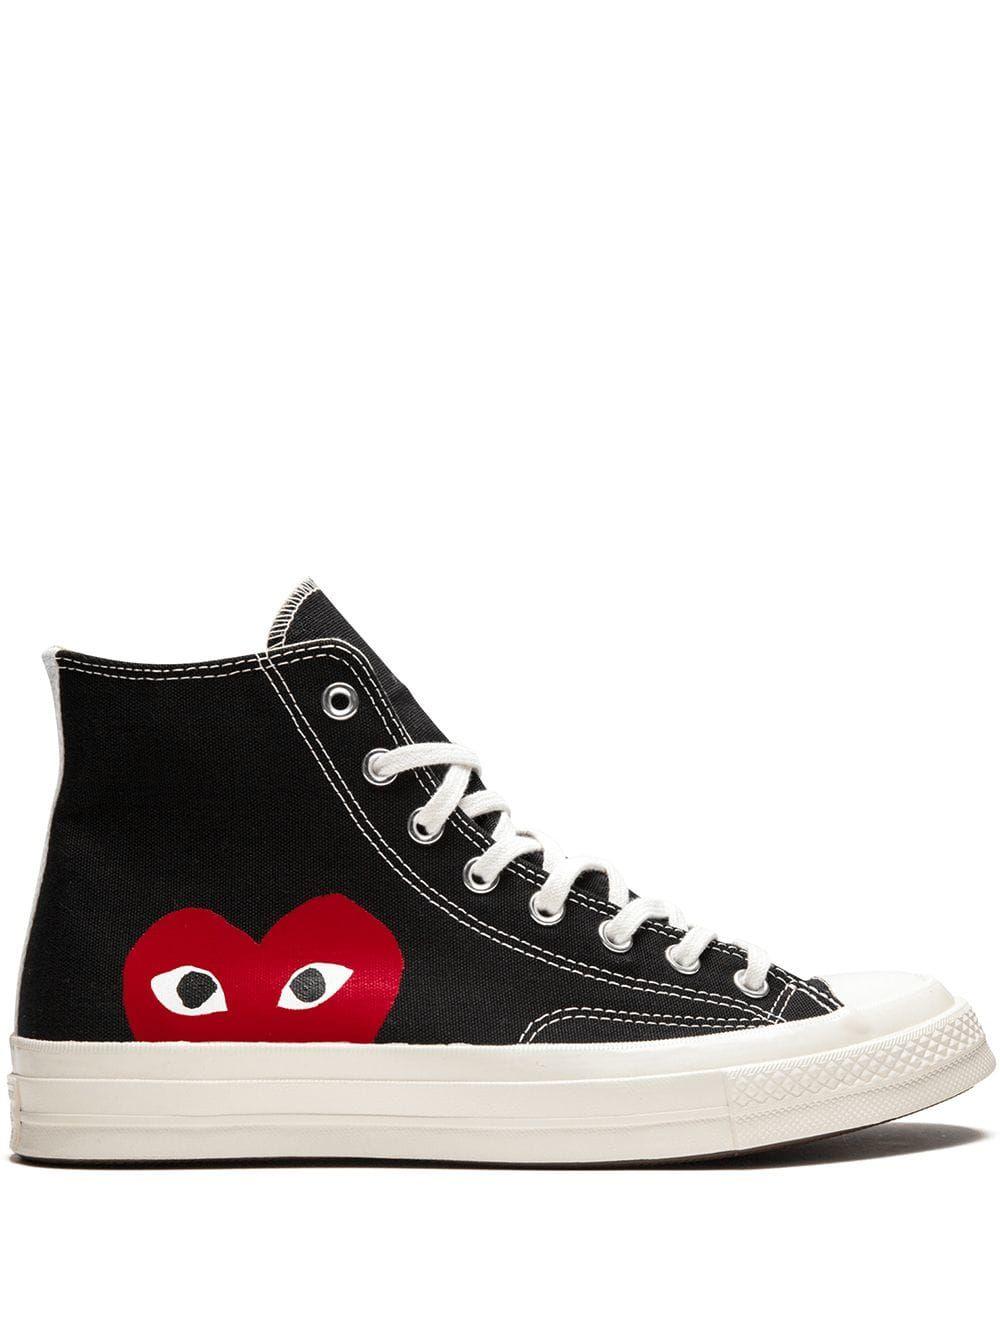 cdg black high top converse